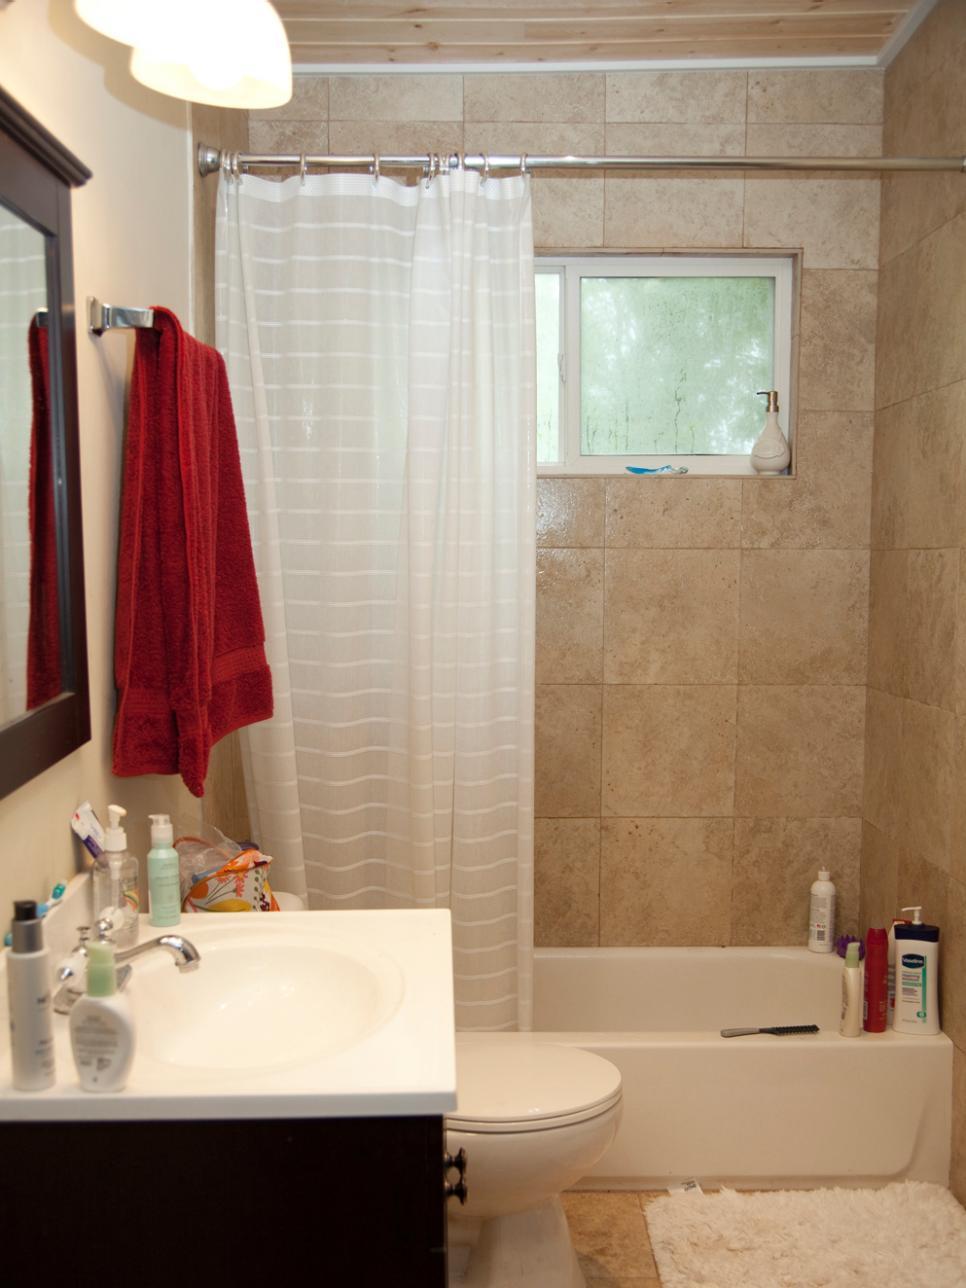 25 Mid-Century Bathroom Design Ideas - Decoration Love on Modern:5O8Dgixth9O= Small Bathroom Design  id=88354